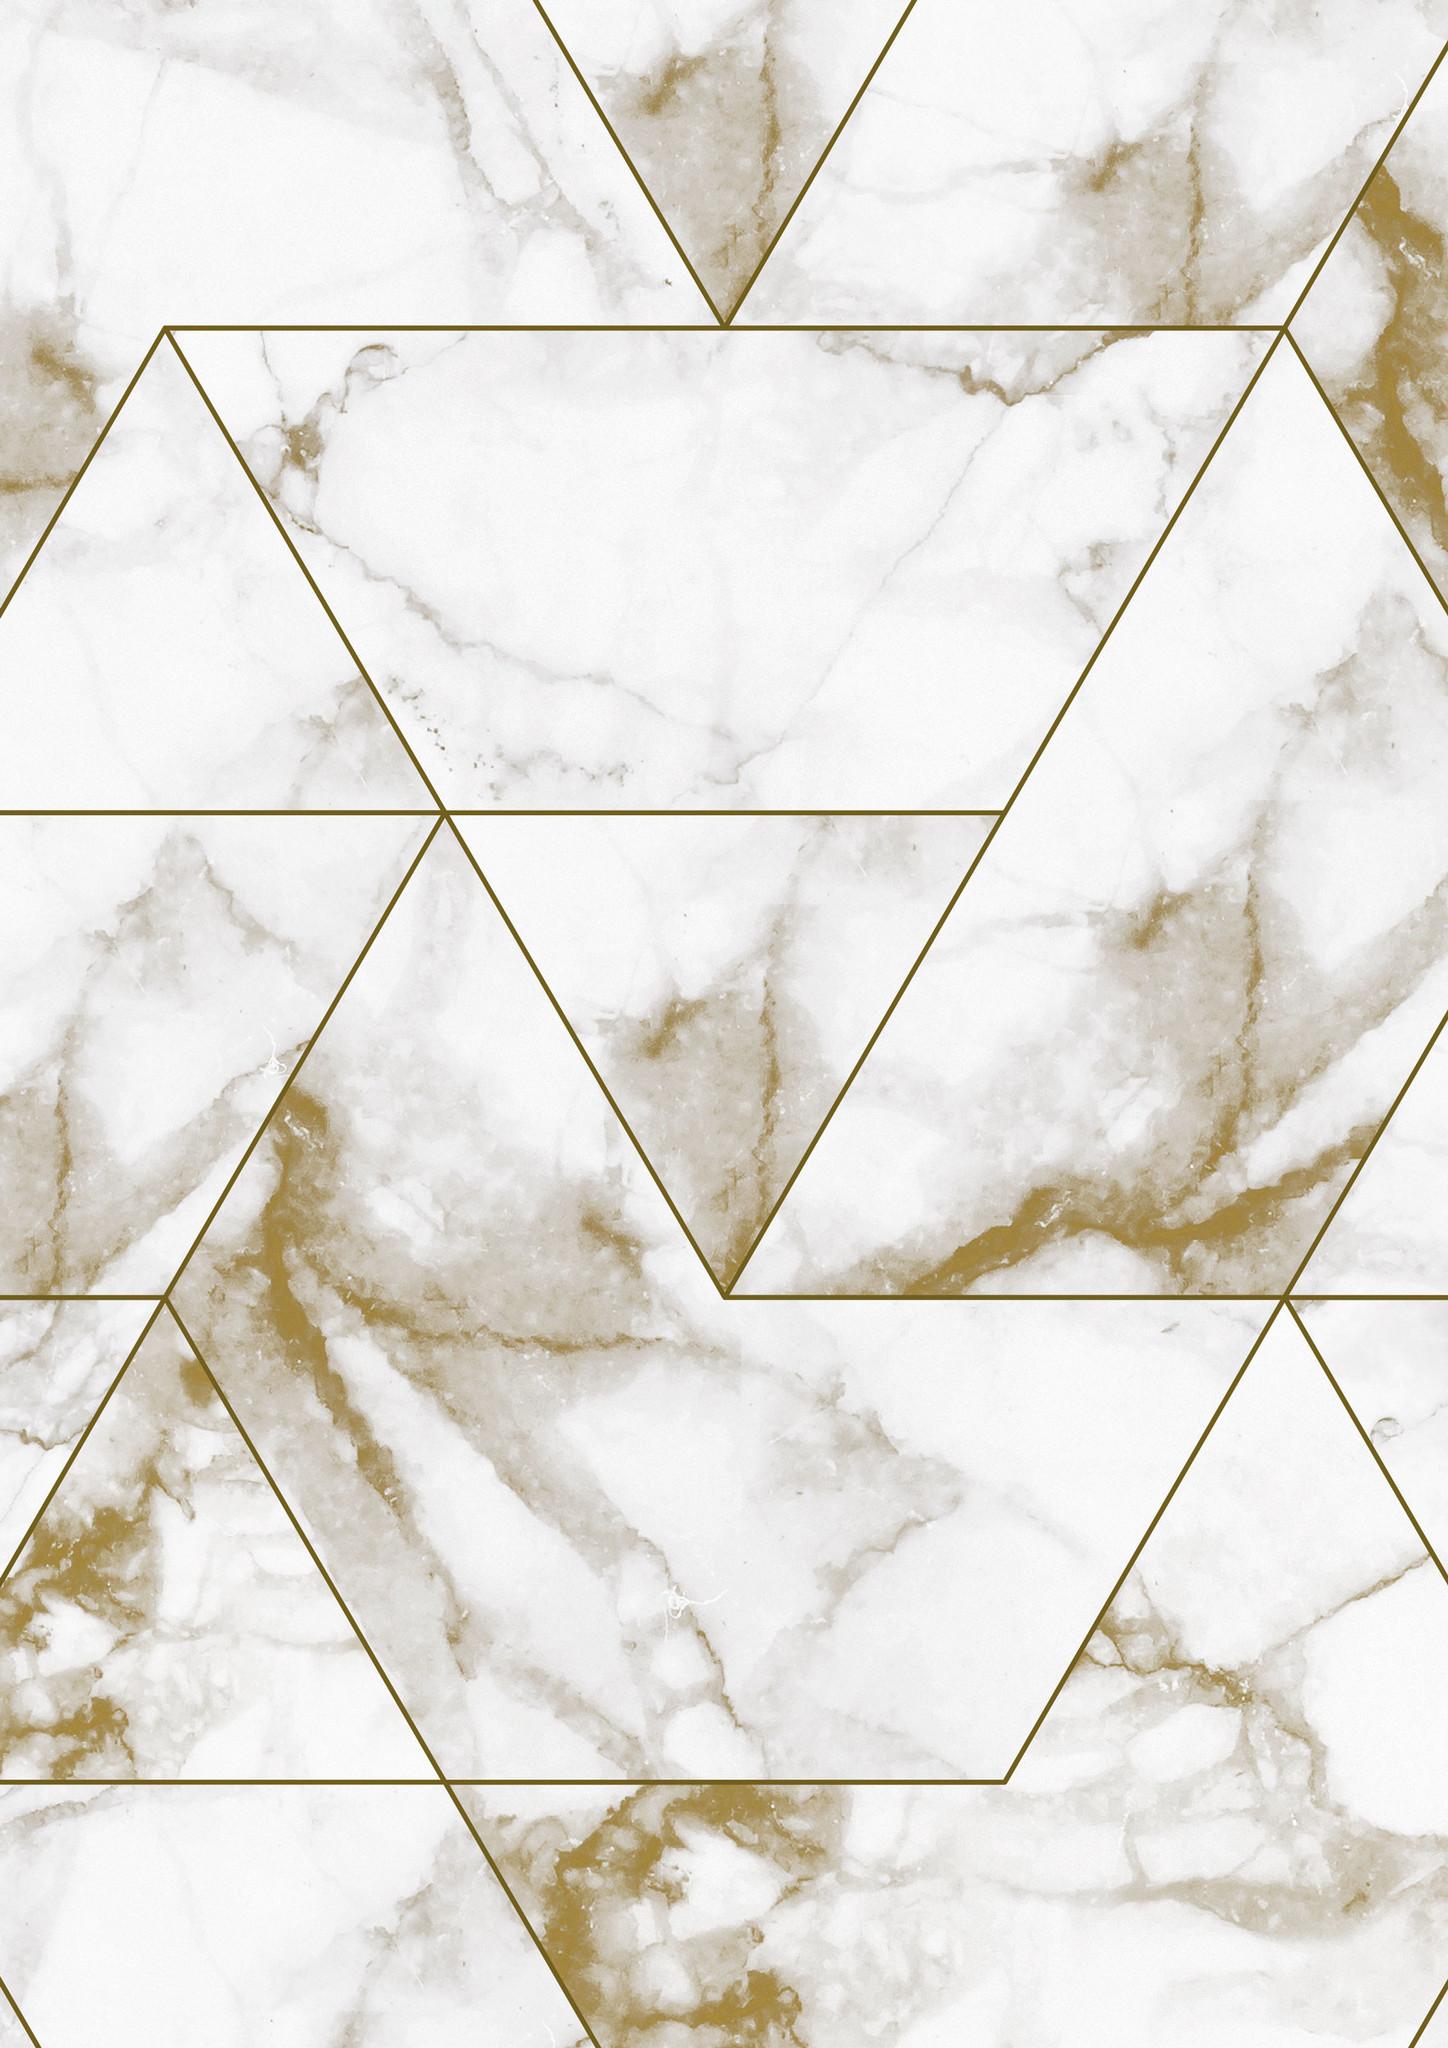 Behang Marmer Mosaic - 97.4 x 280 wit-goud-2